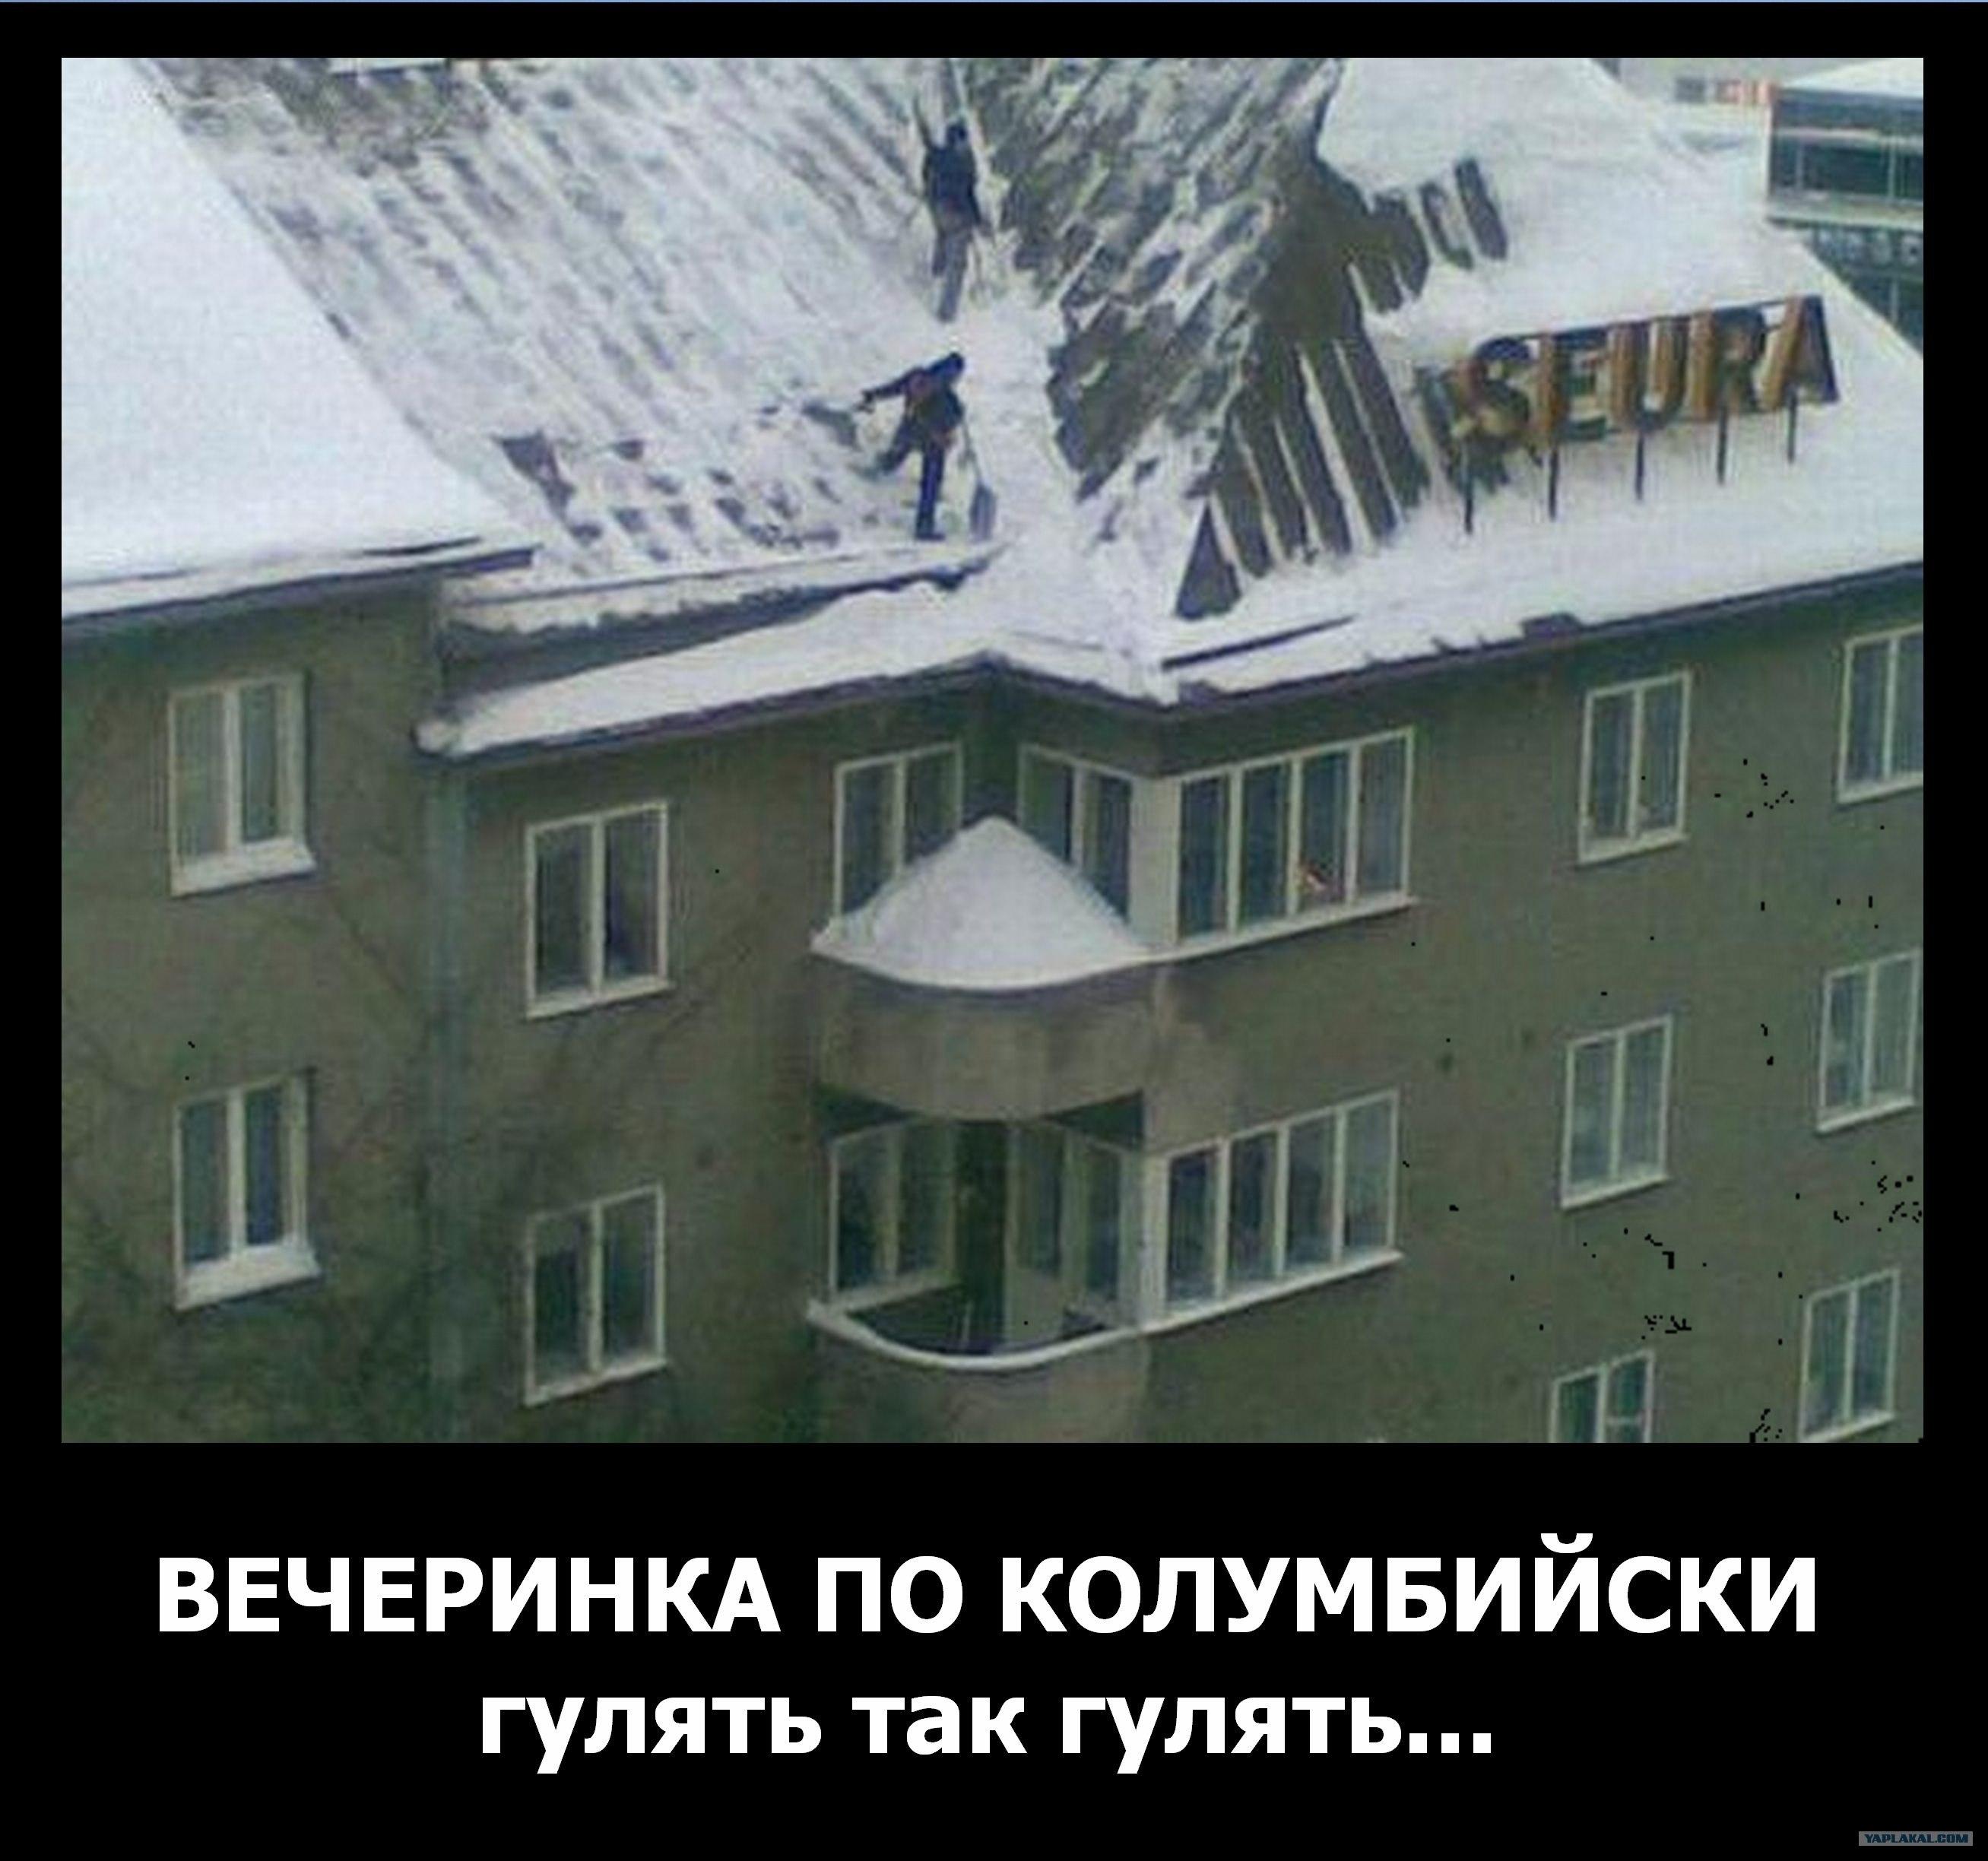 http://s2.uploads.ru/6rVJS.jpg